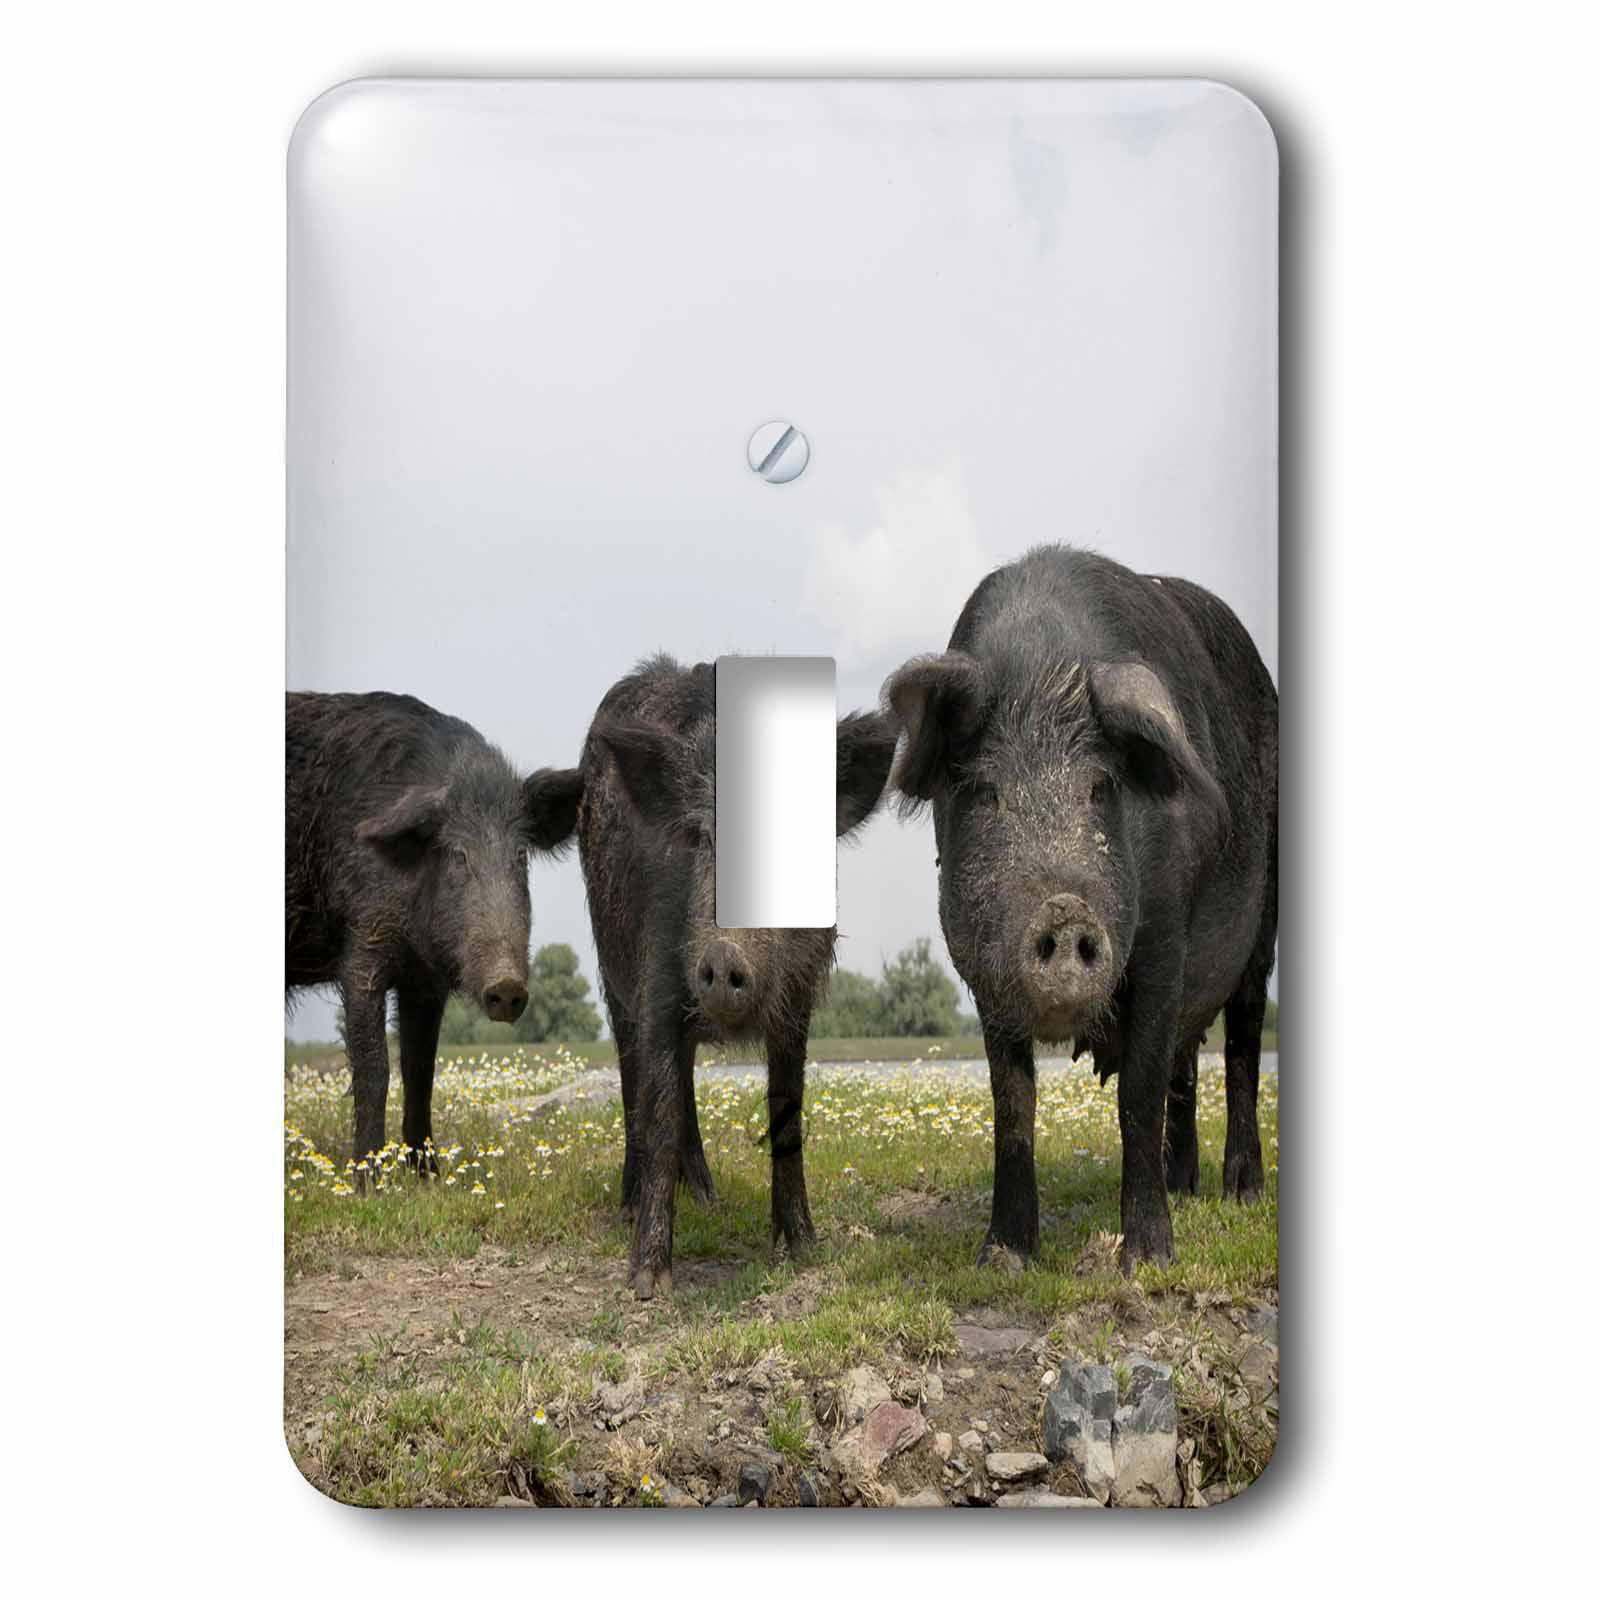 3dRose Pigs of Maliuc, Romania - EU24 MZW0180 - Martin Zwick, 2 Plug Outlet Cover